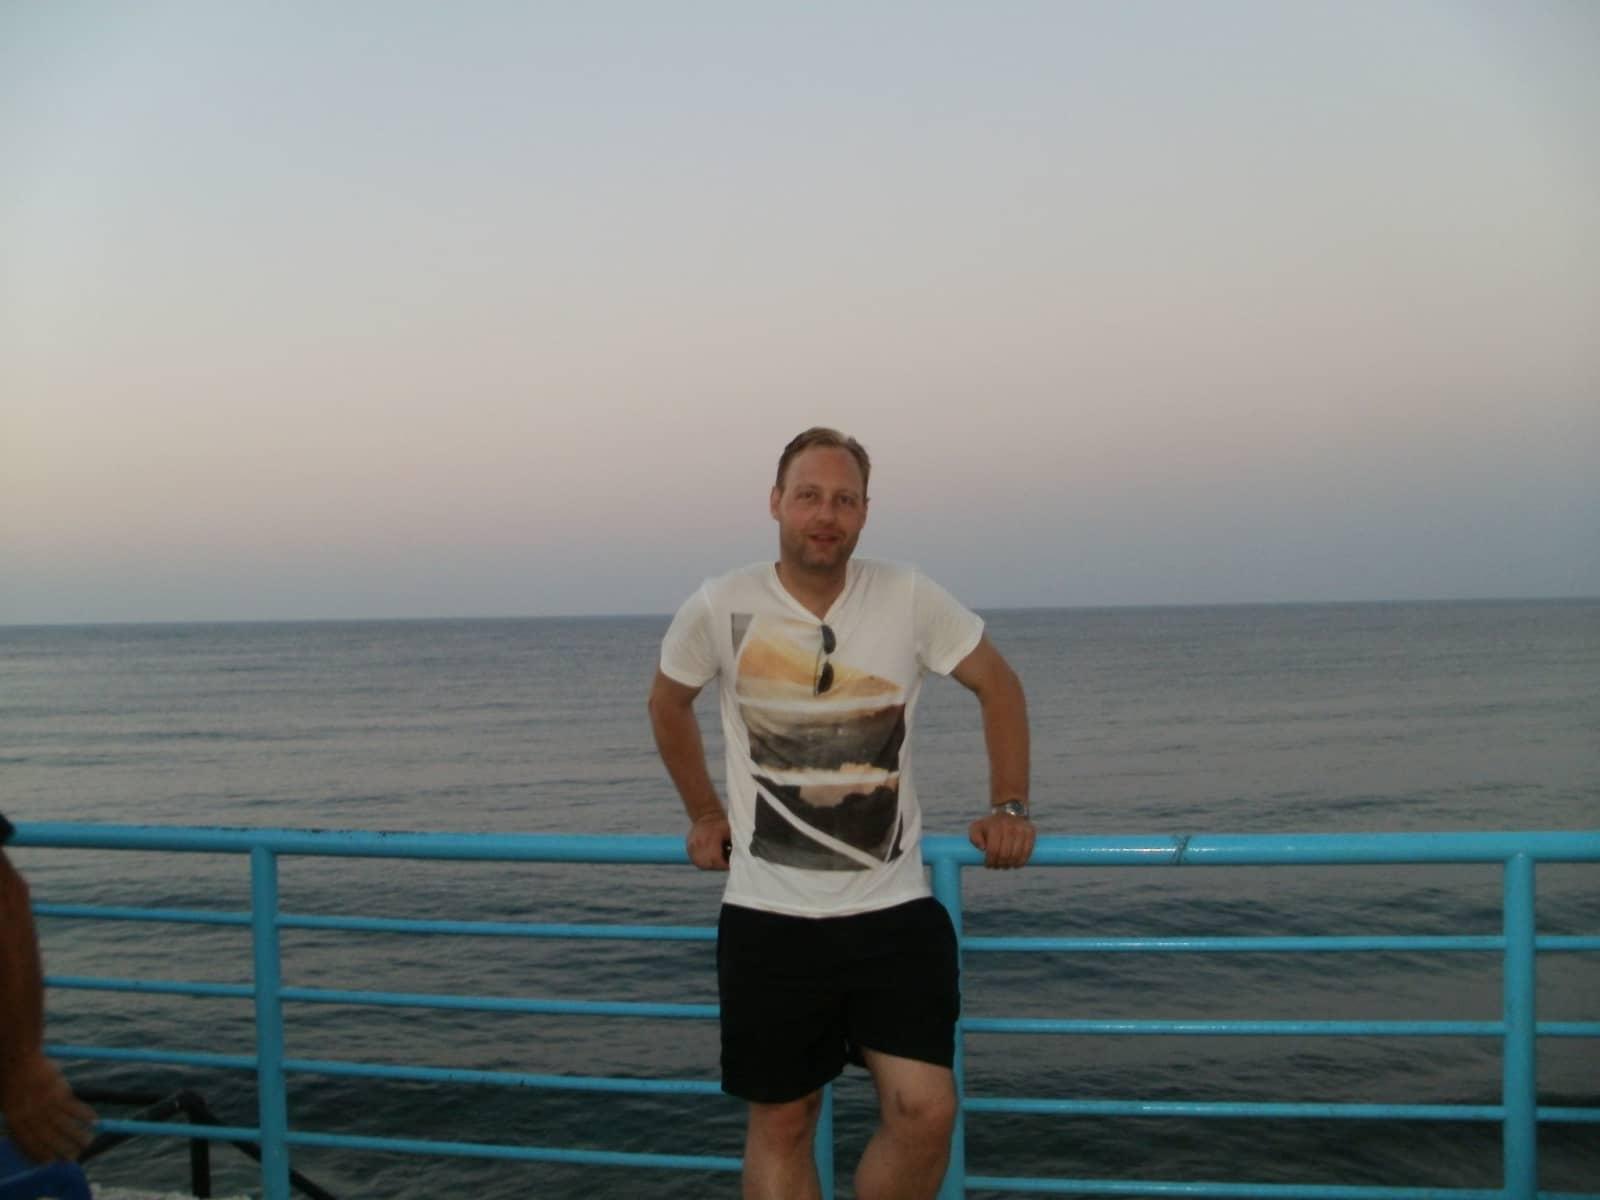 Martinus from Liverpool, United Kingdom